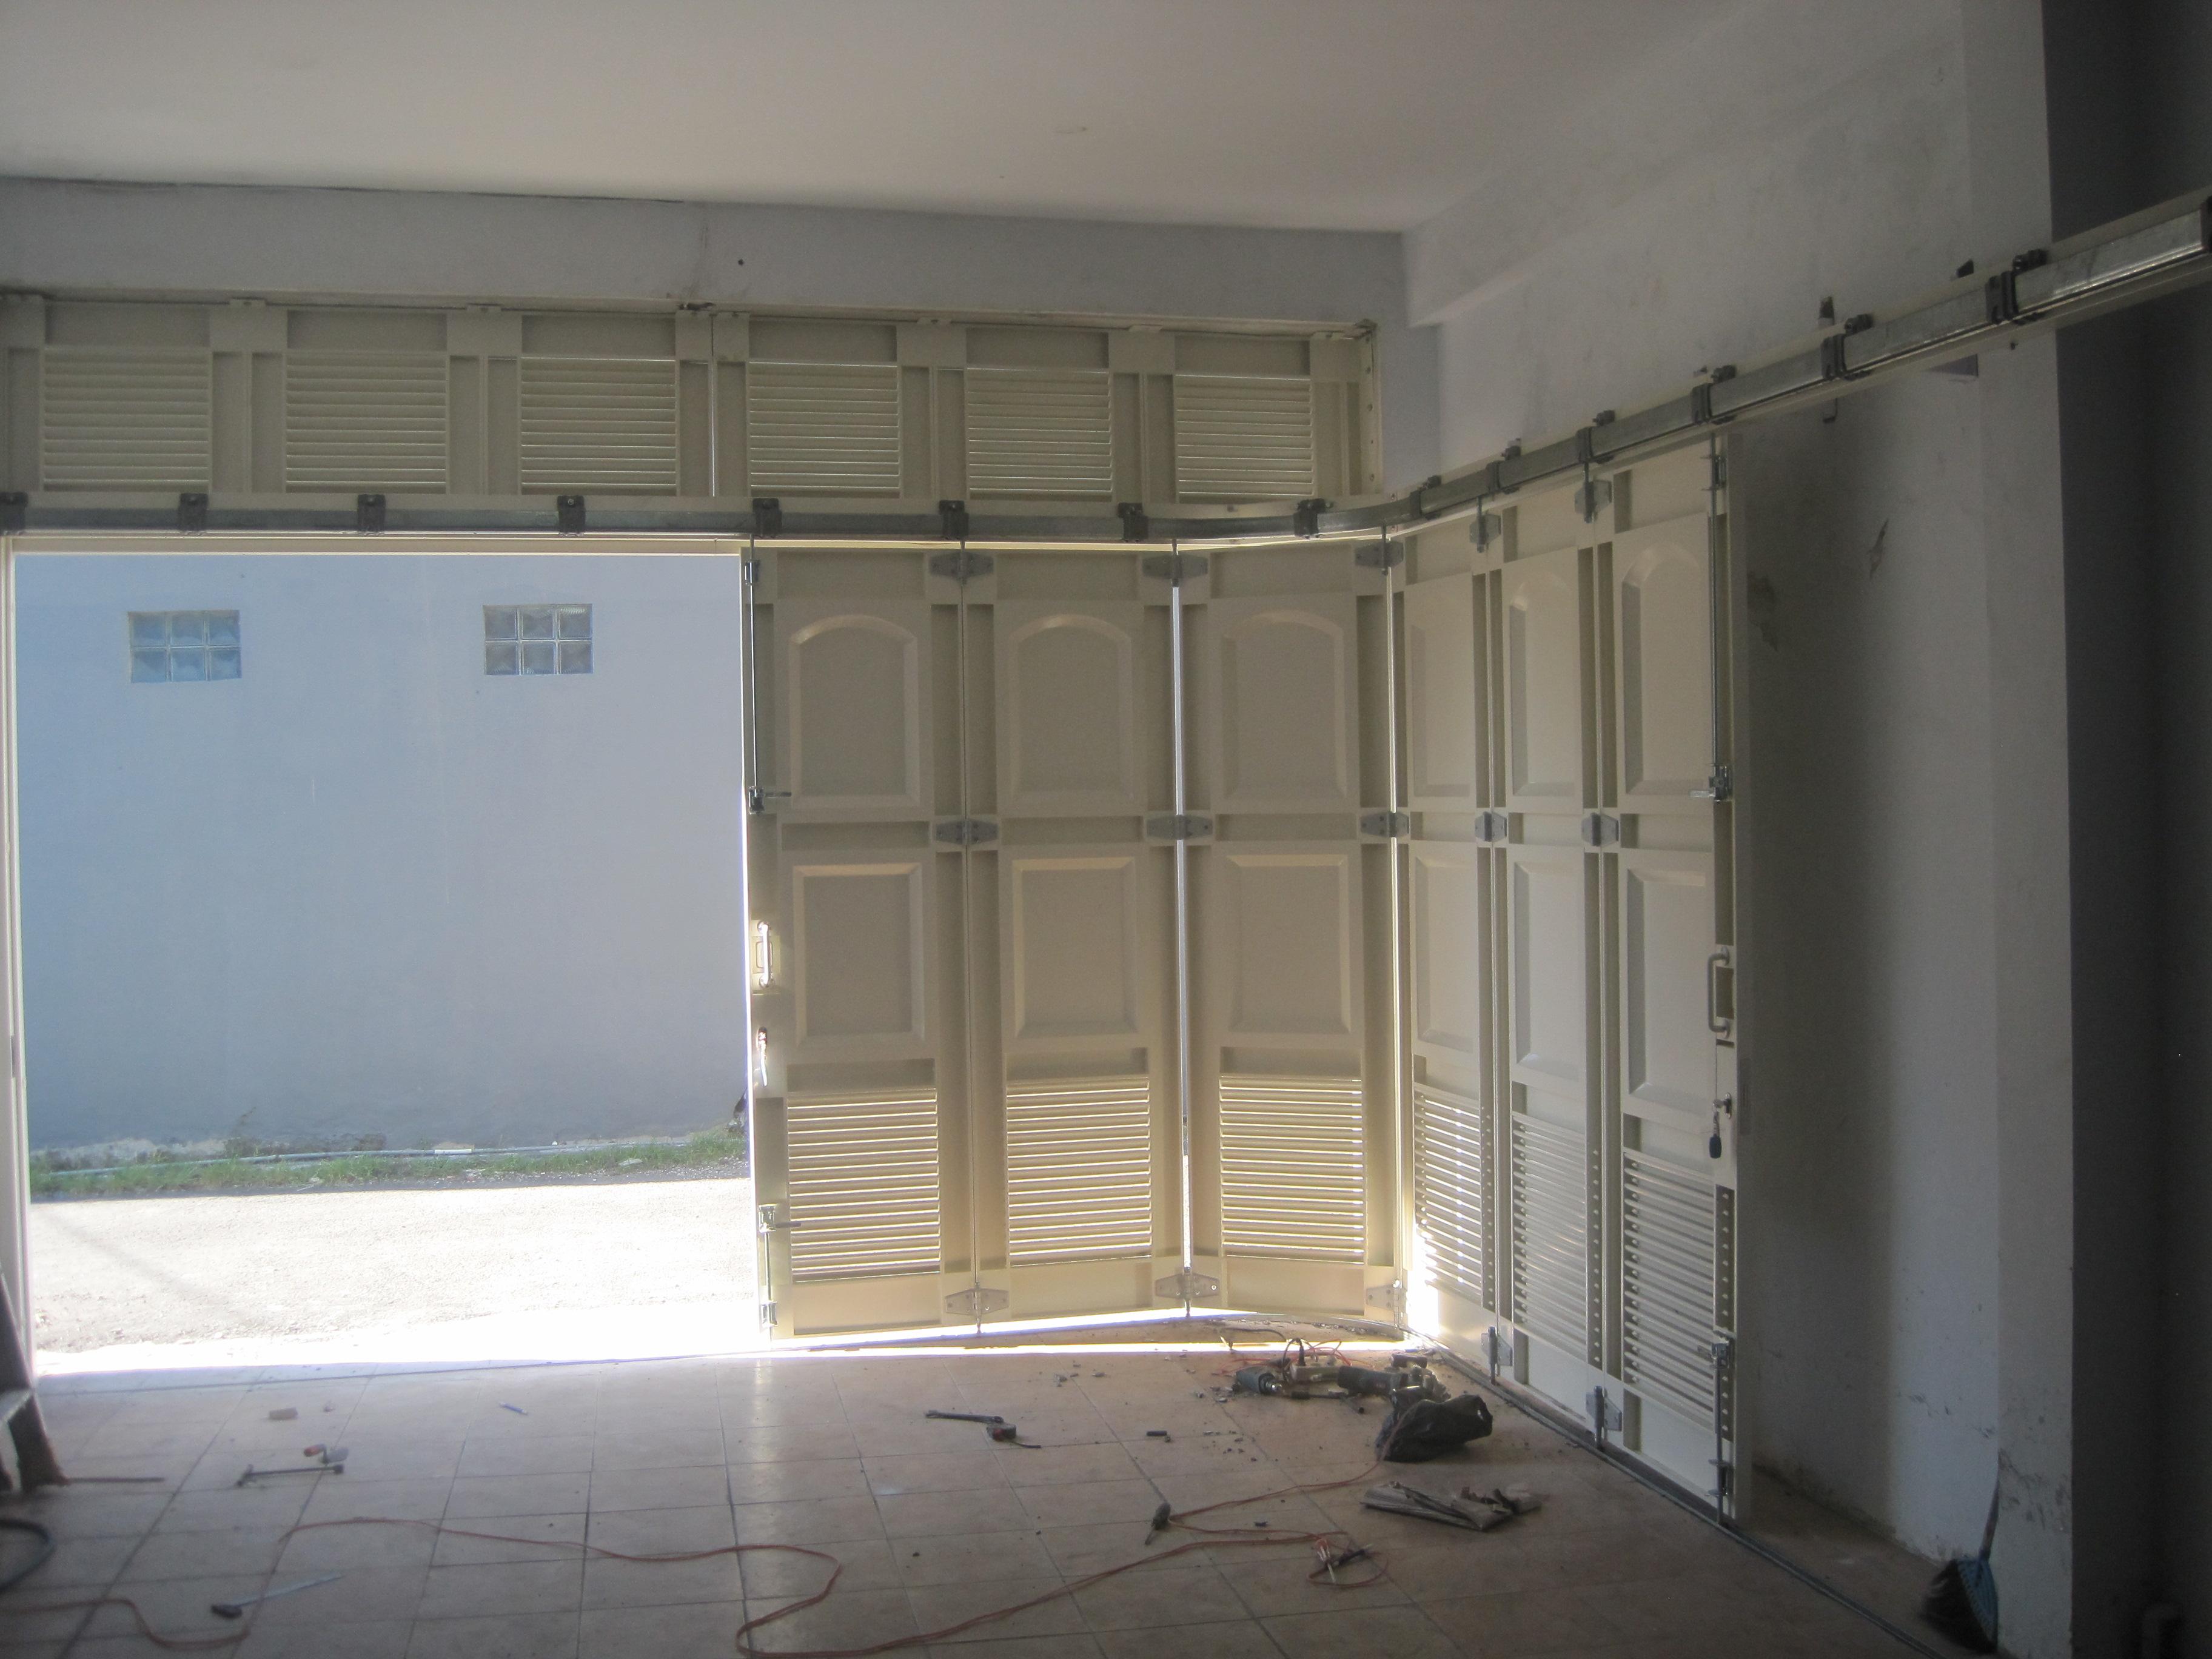 Pusat Pintu Garasi Besi Wina  Rel Pintu Garasi Wina